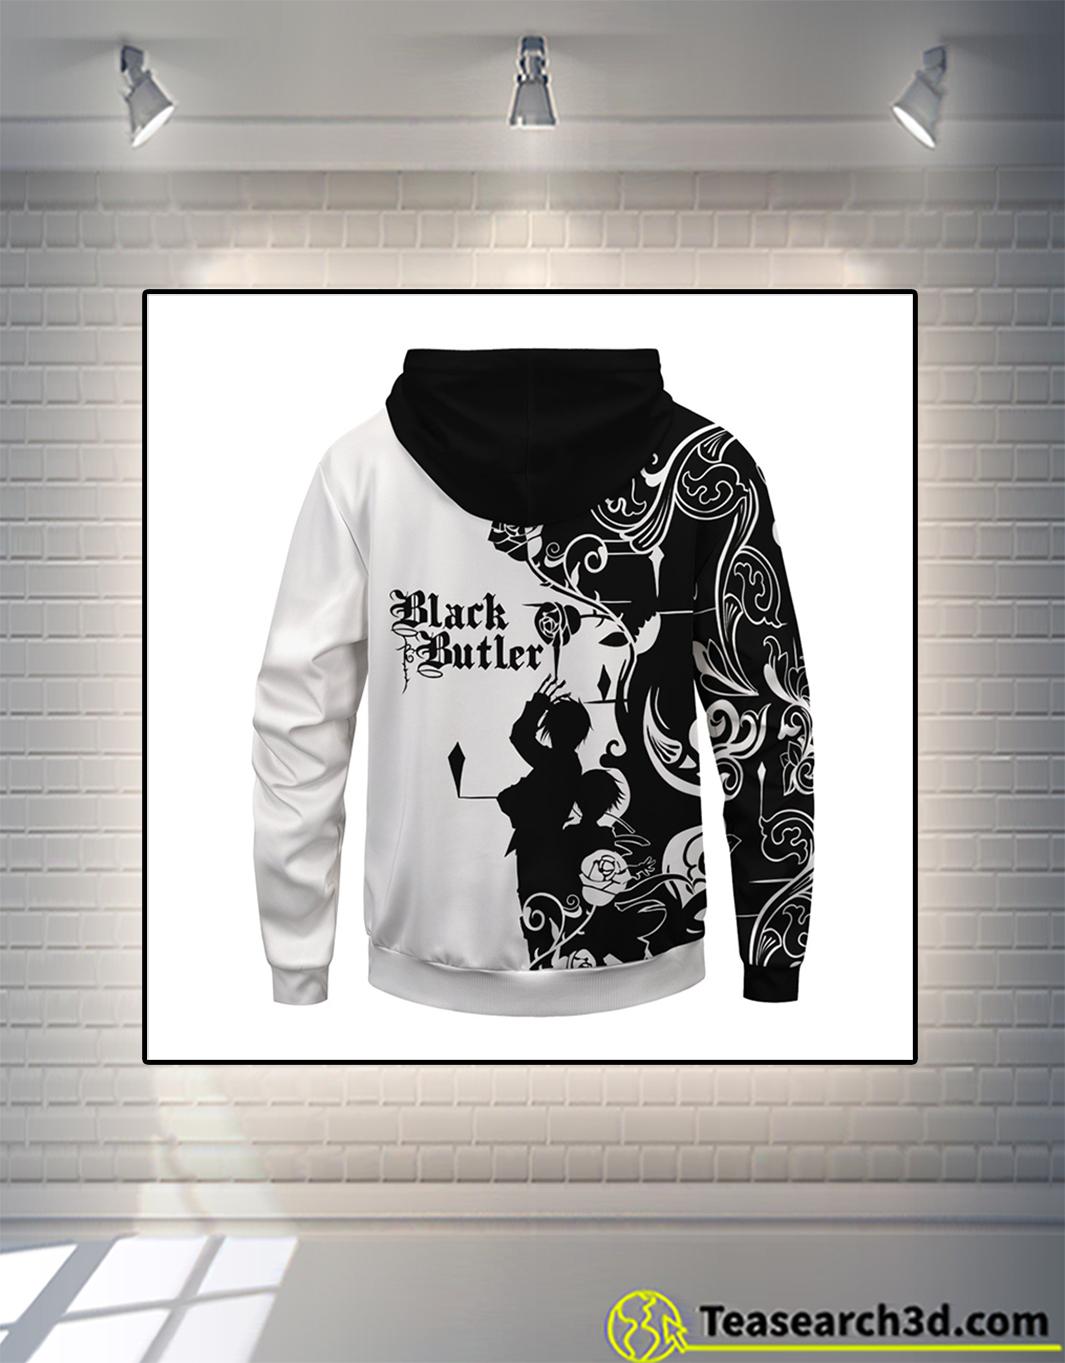 Black butler unisex pullover hoodie back